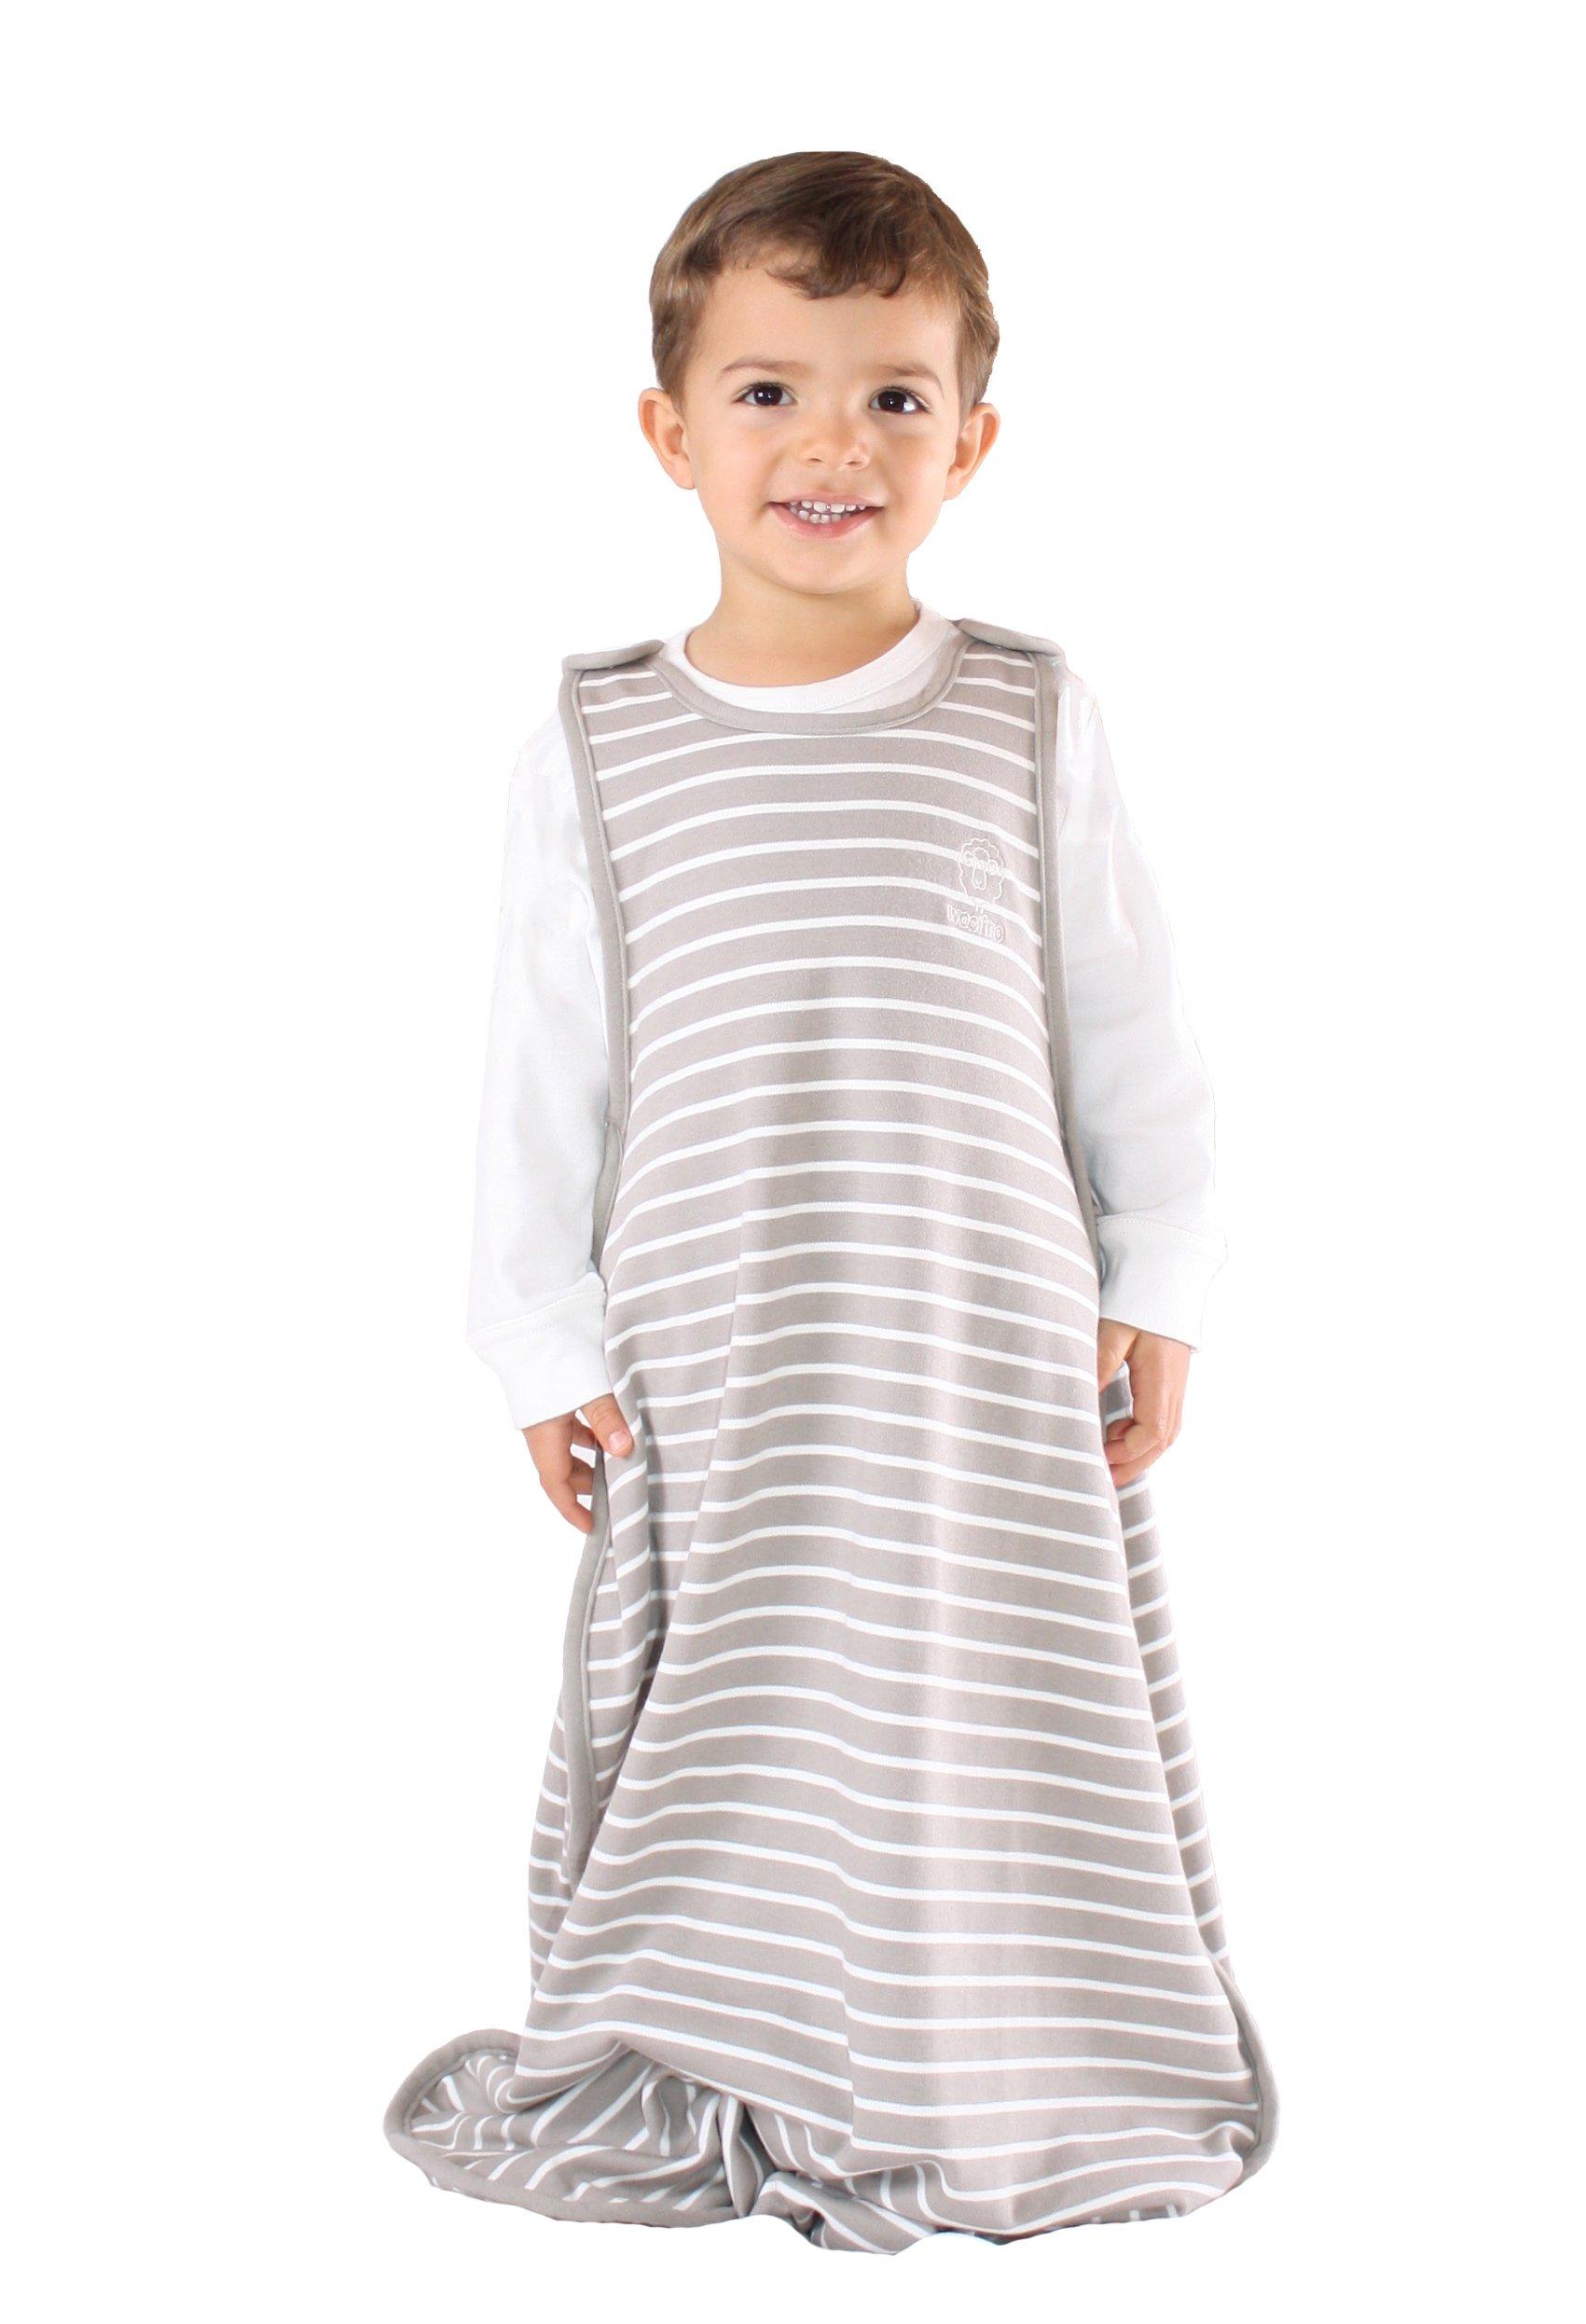 Woolino Toddler Sleeping Bag, 4 Season Merino Wool Baby Sleep Bag or Sack, 2-4 Years, Earth by Woolino